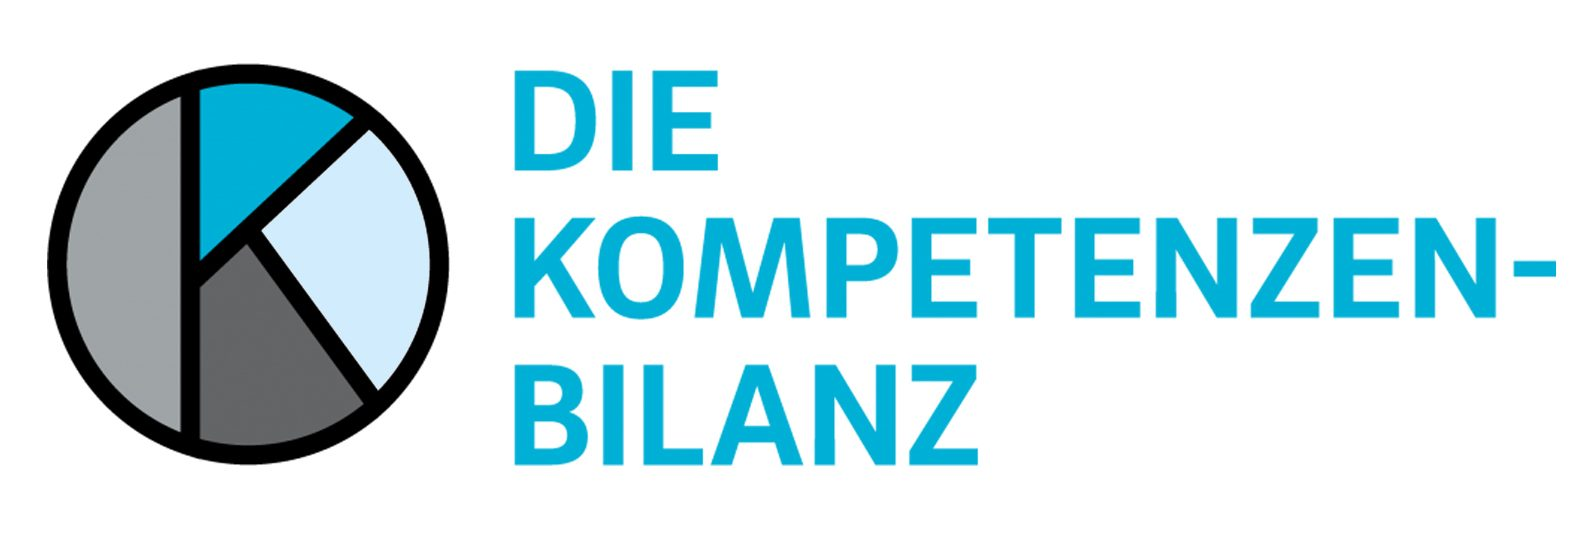 Kompetenzenbilanz Logo